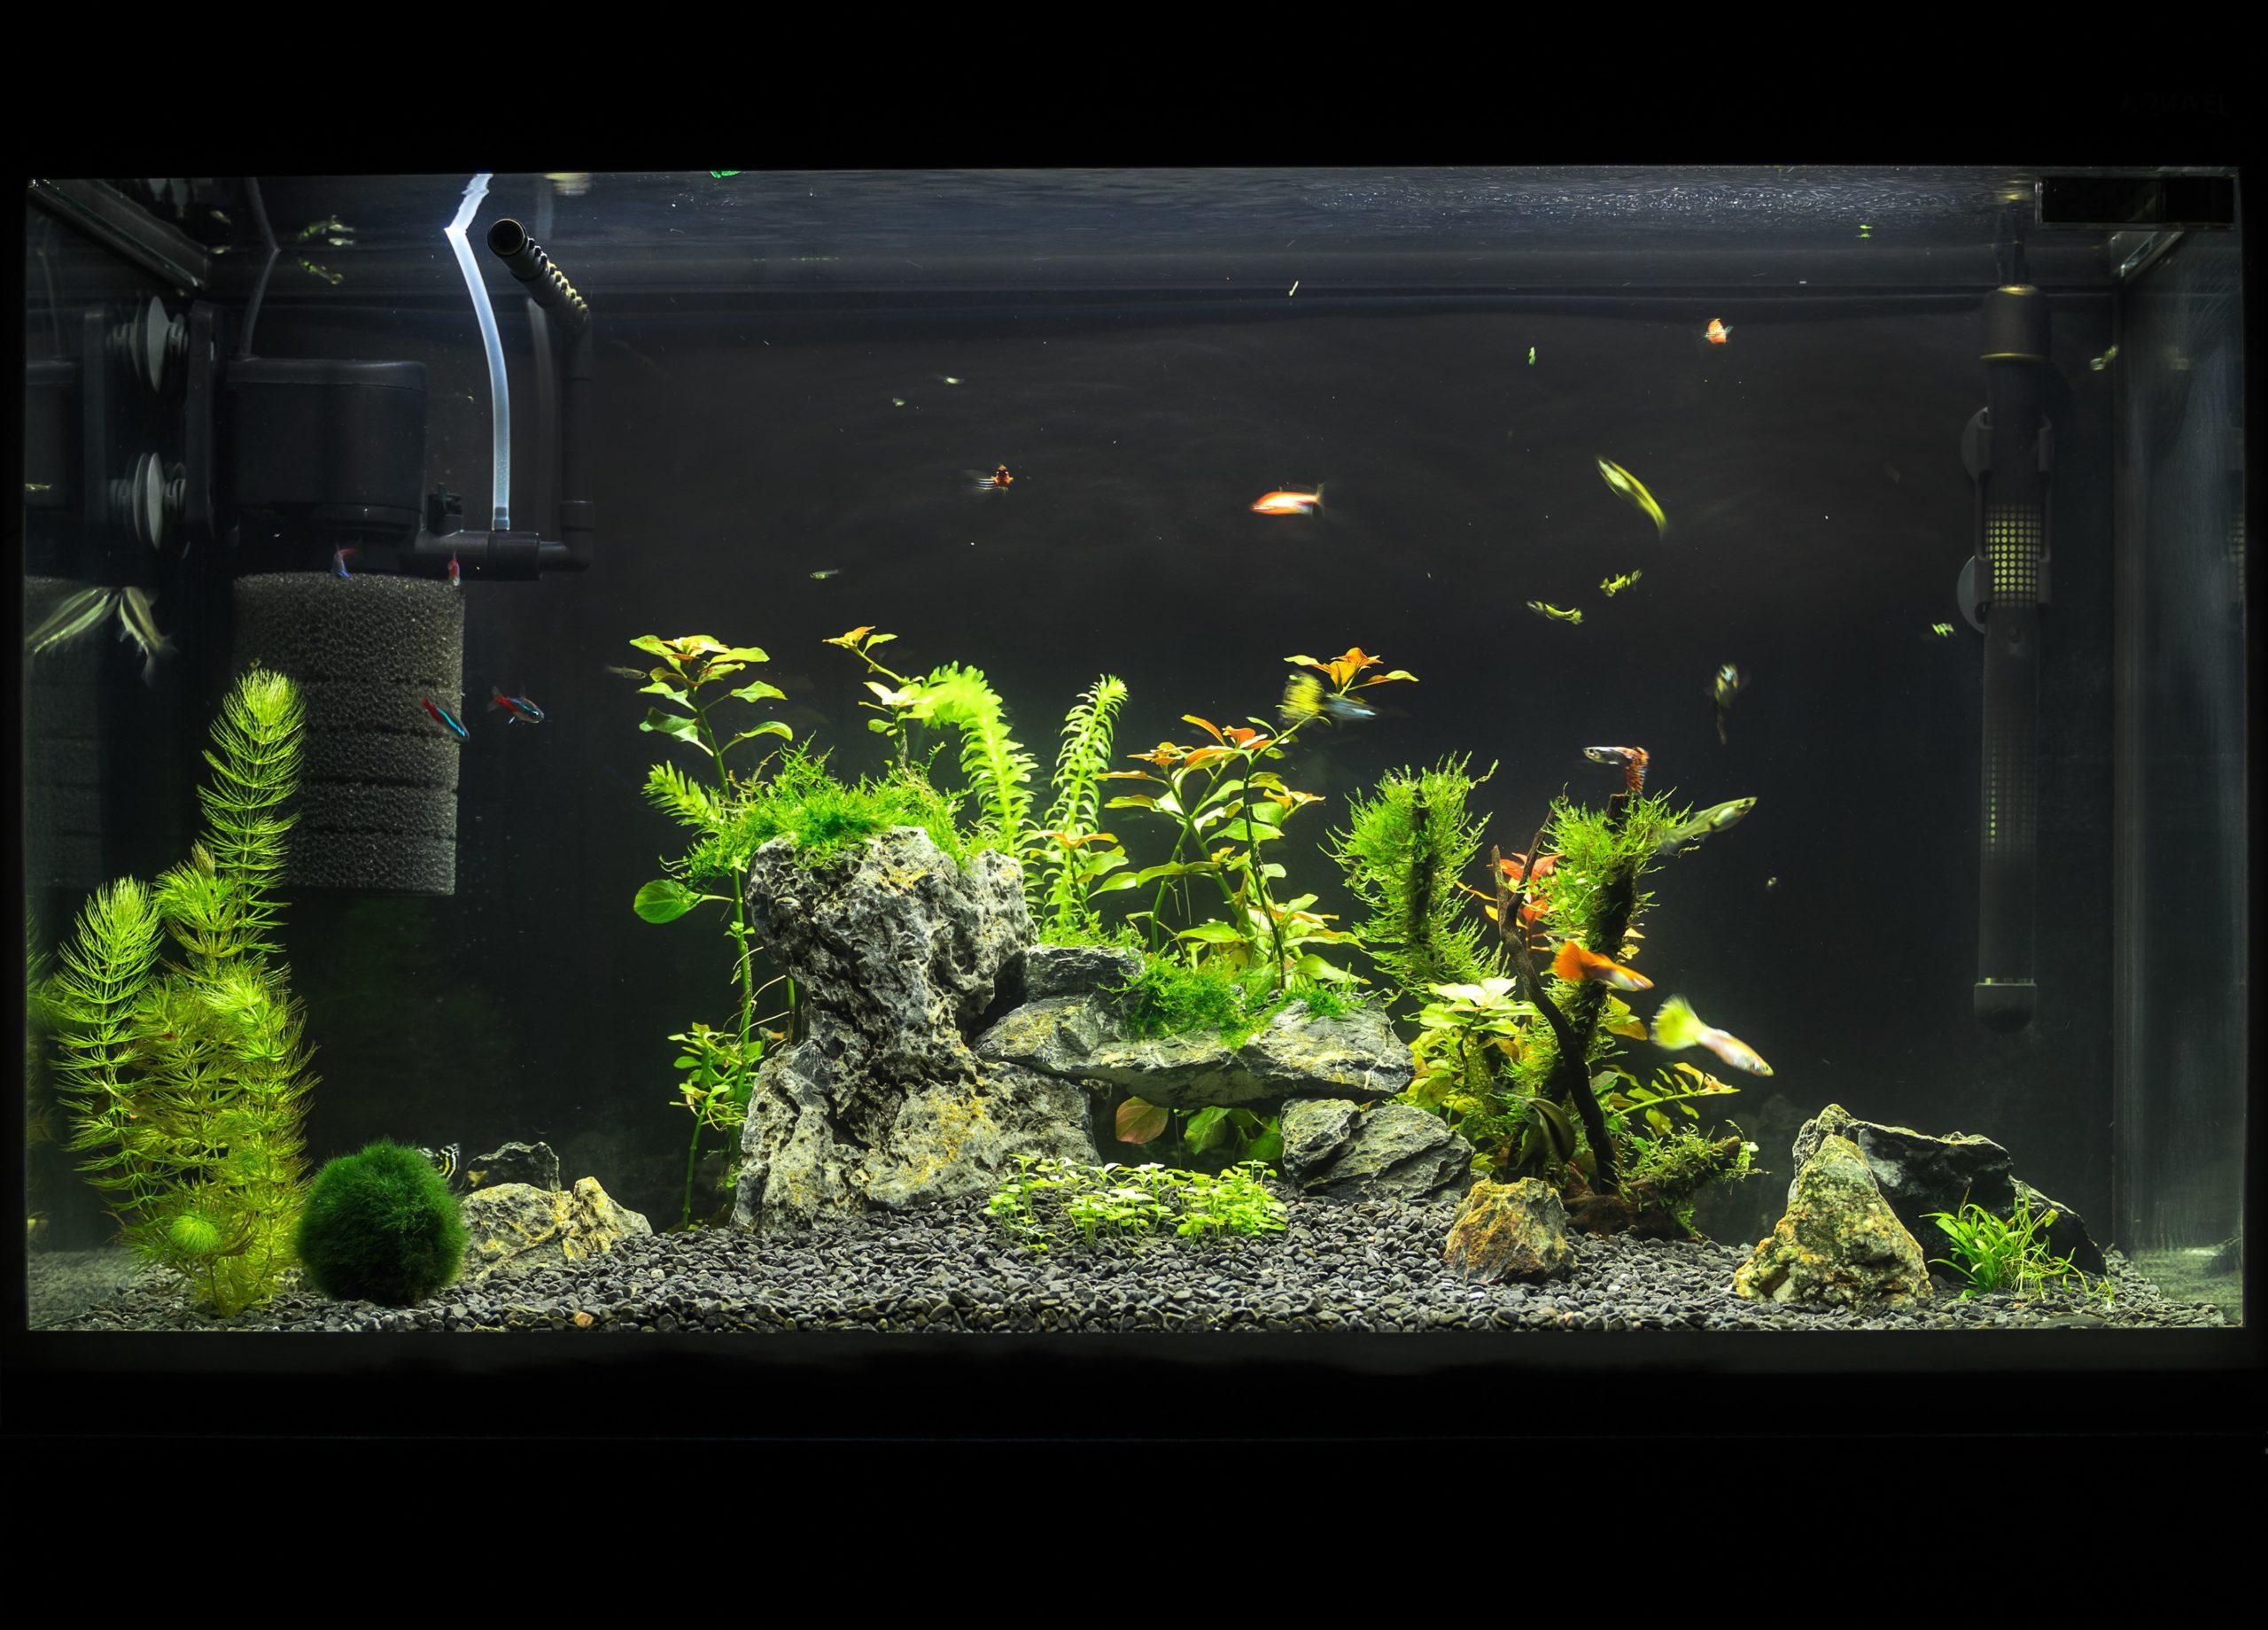 filtro-para-aquario-blog-cobasi